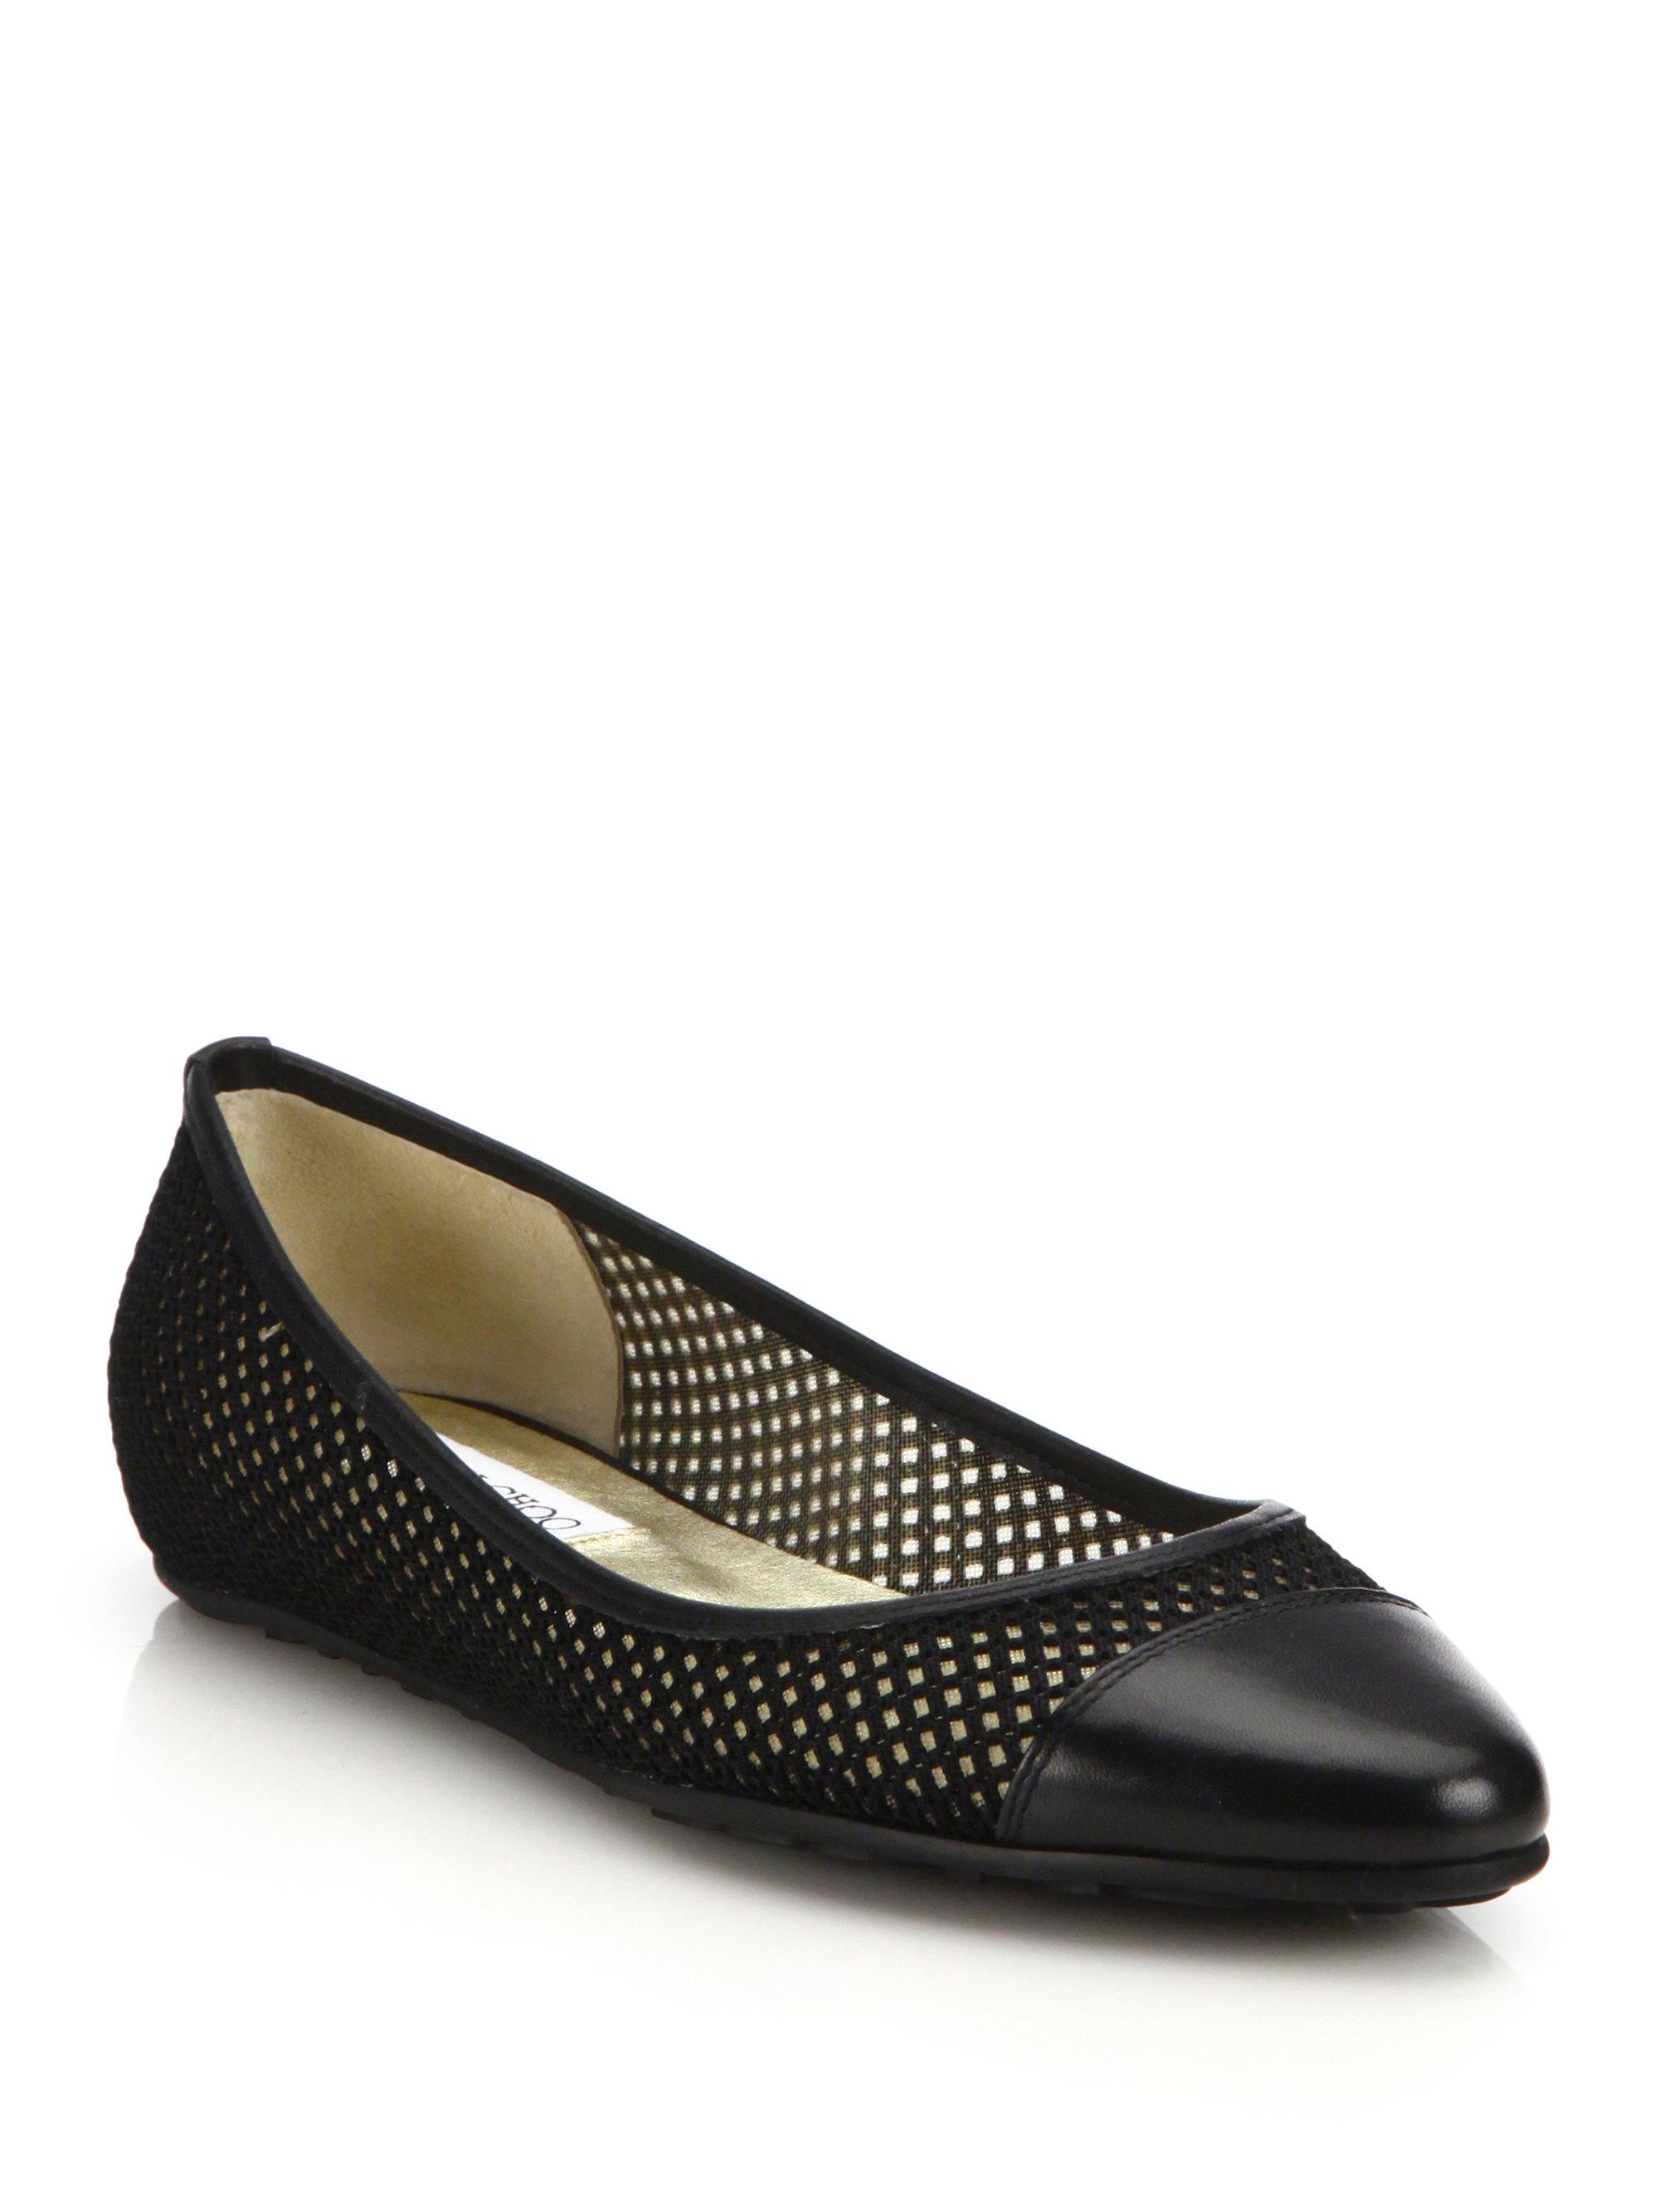 09fd27762e ... spain pre owned black patent leather ballet flats jimmy choo london  675dd b94c0